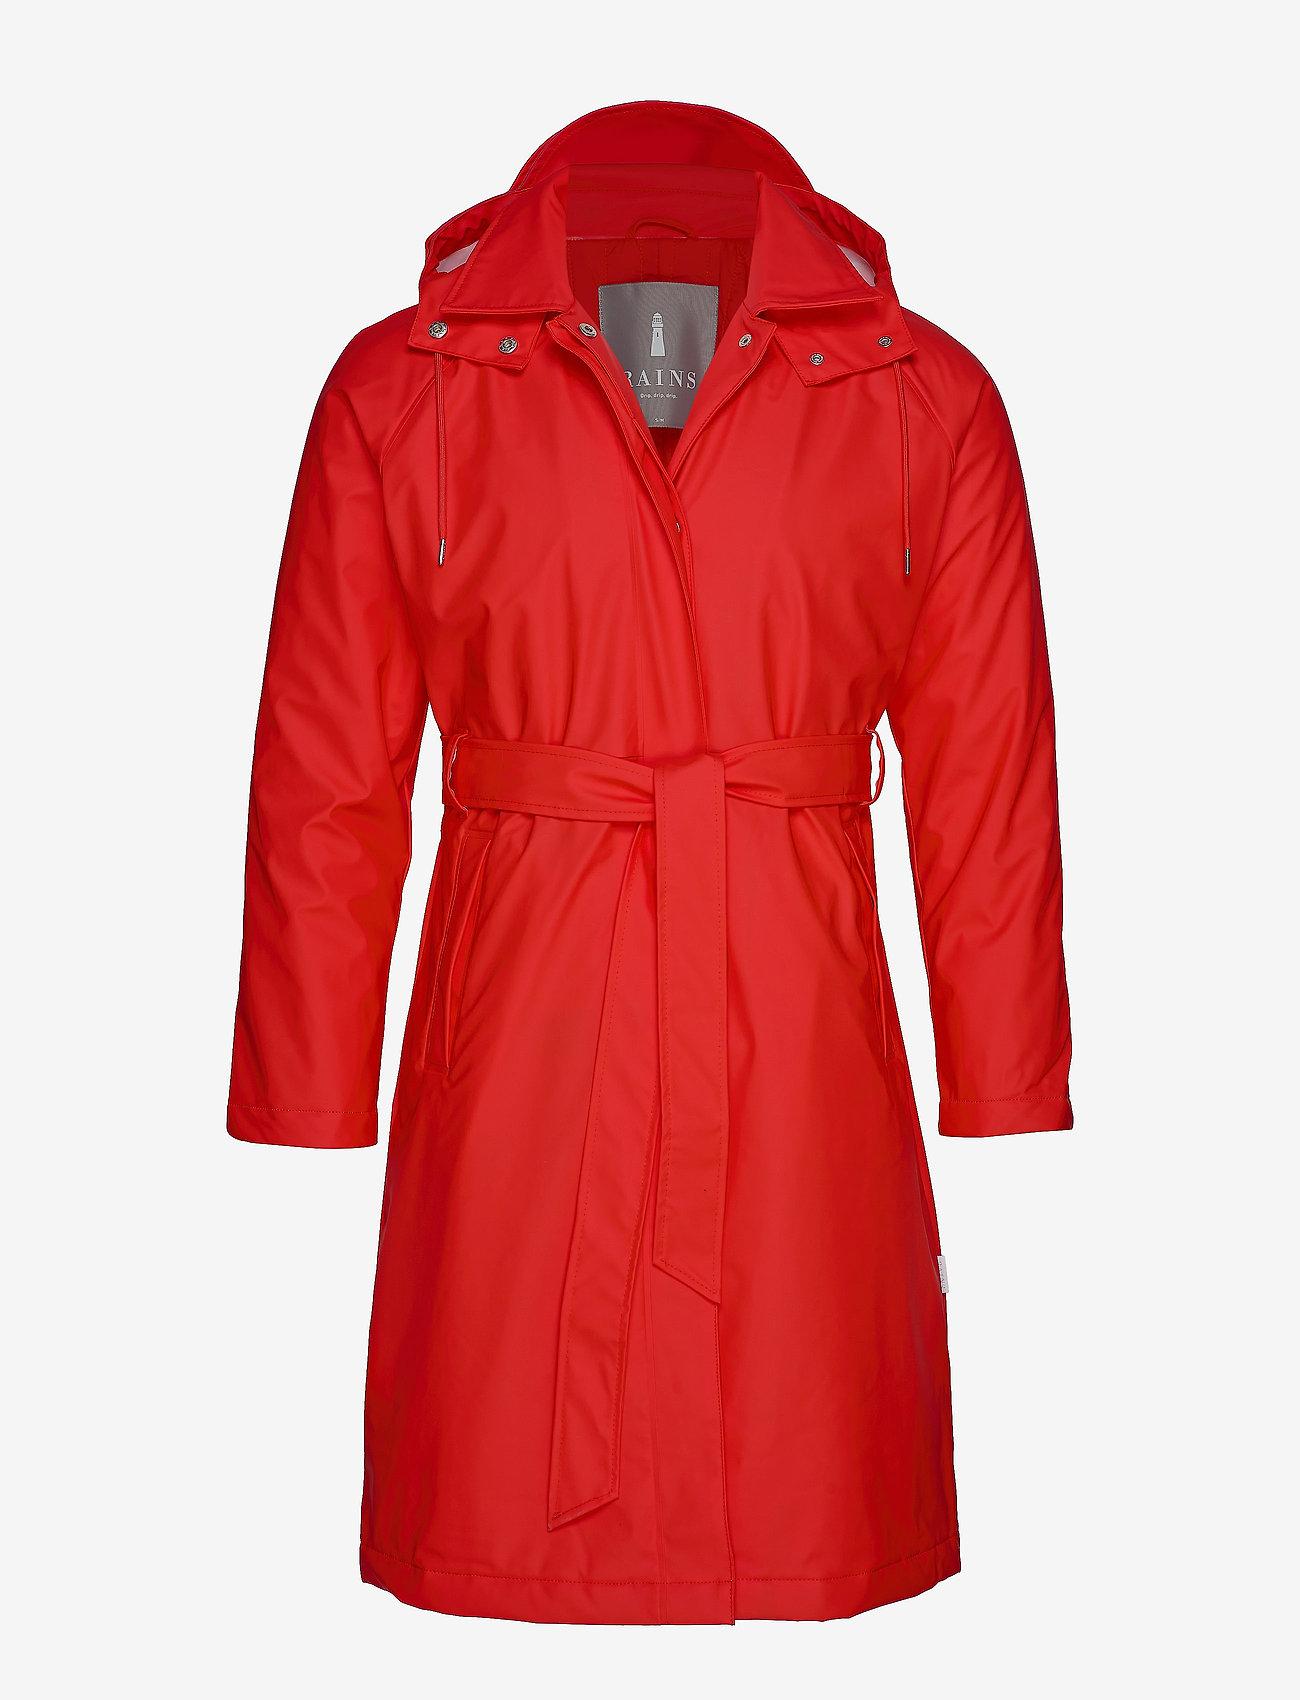 Rains - W Trench Coat - regenbekleidung - red - 0